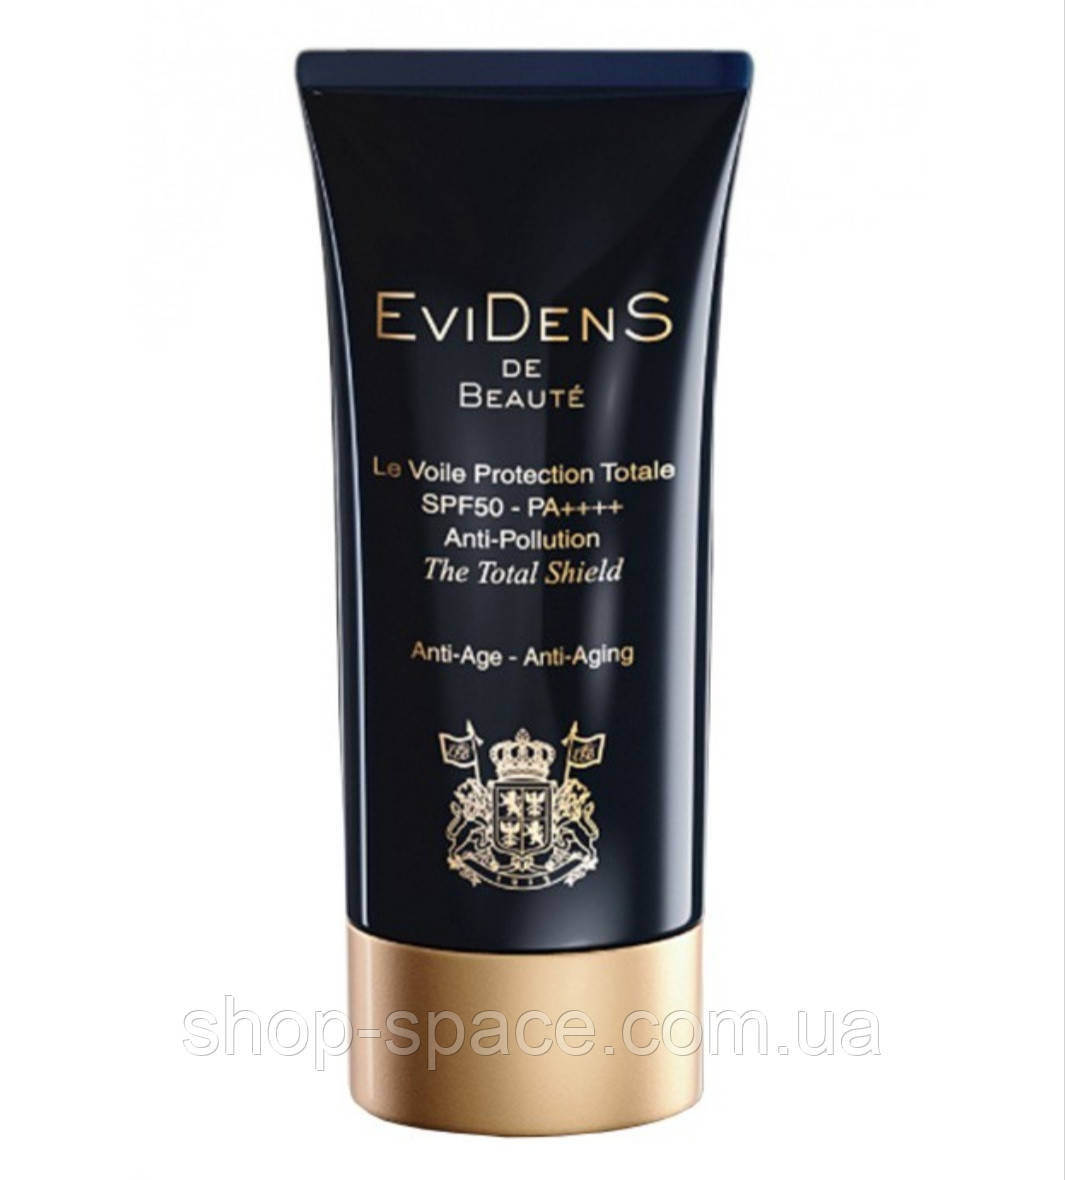 Солнцезащитный крем для лица Evidens de Beaute The Total Shield SPF 50++++